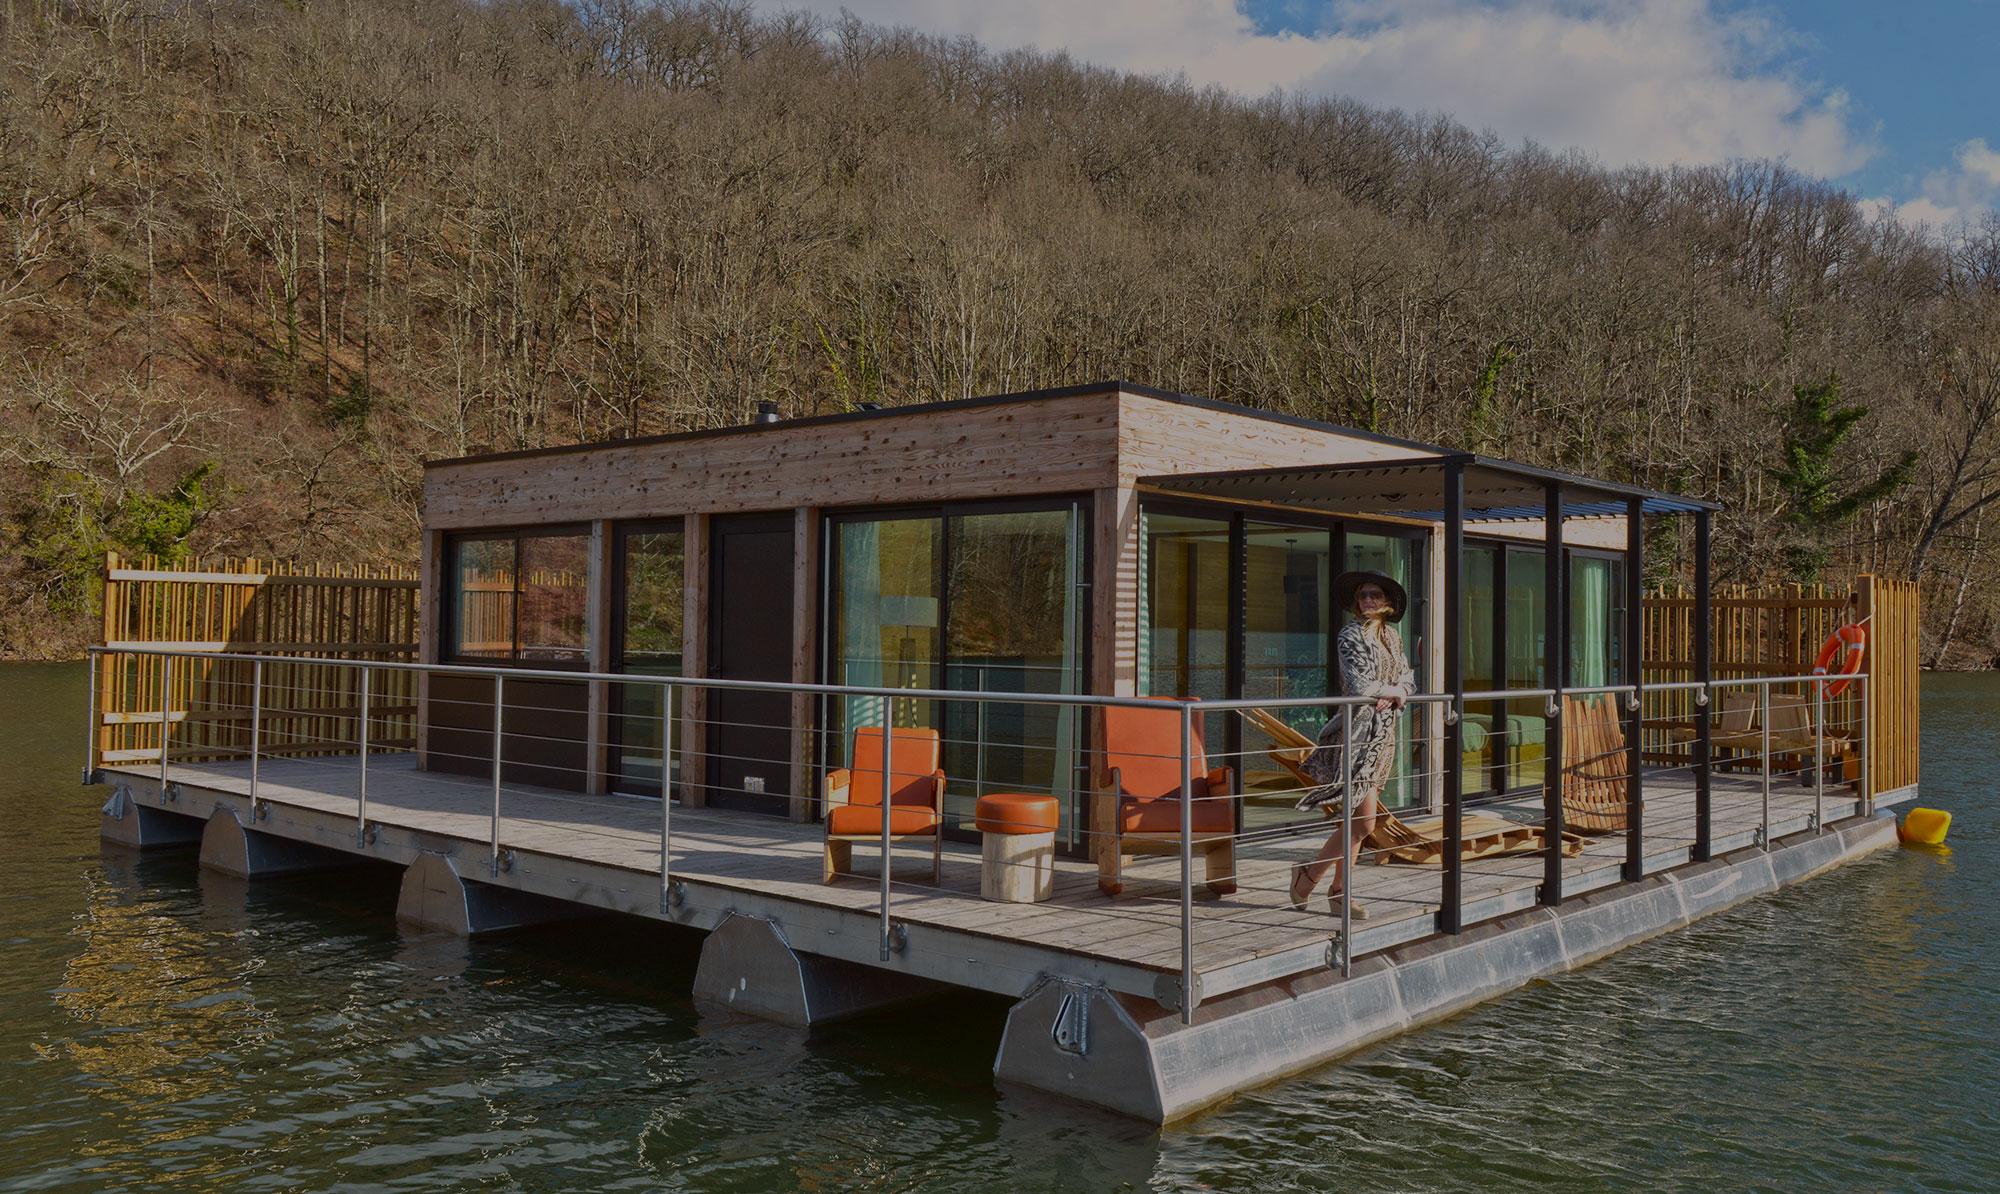 carre vie projet habitat flottant